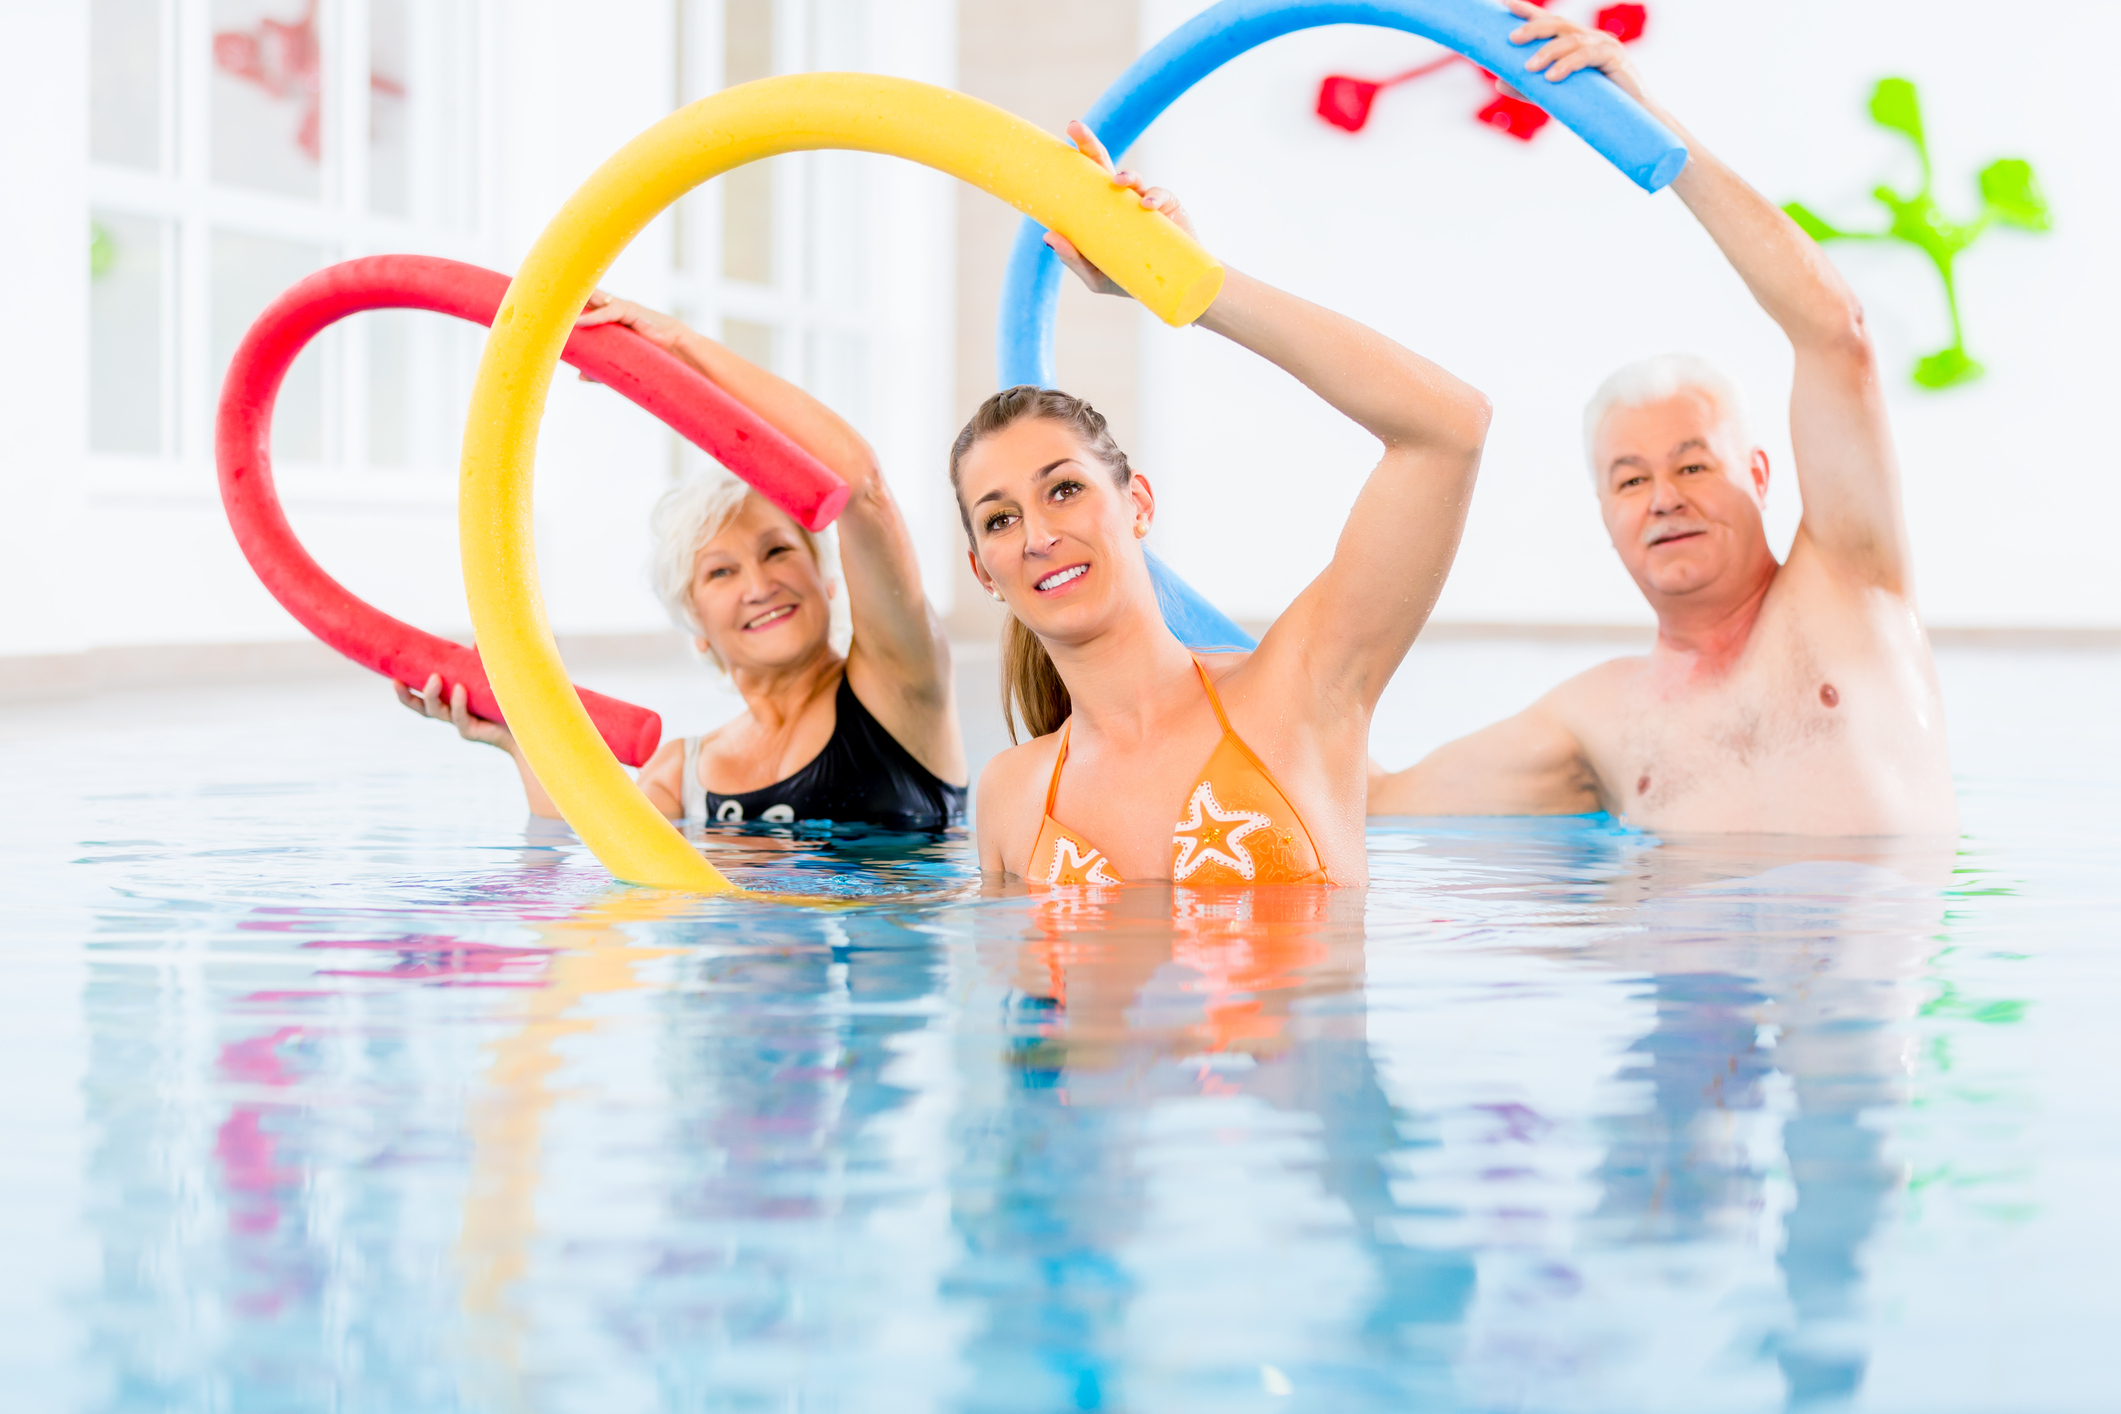 L'aquagym, le sport idéal contre l'arthrose du genou